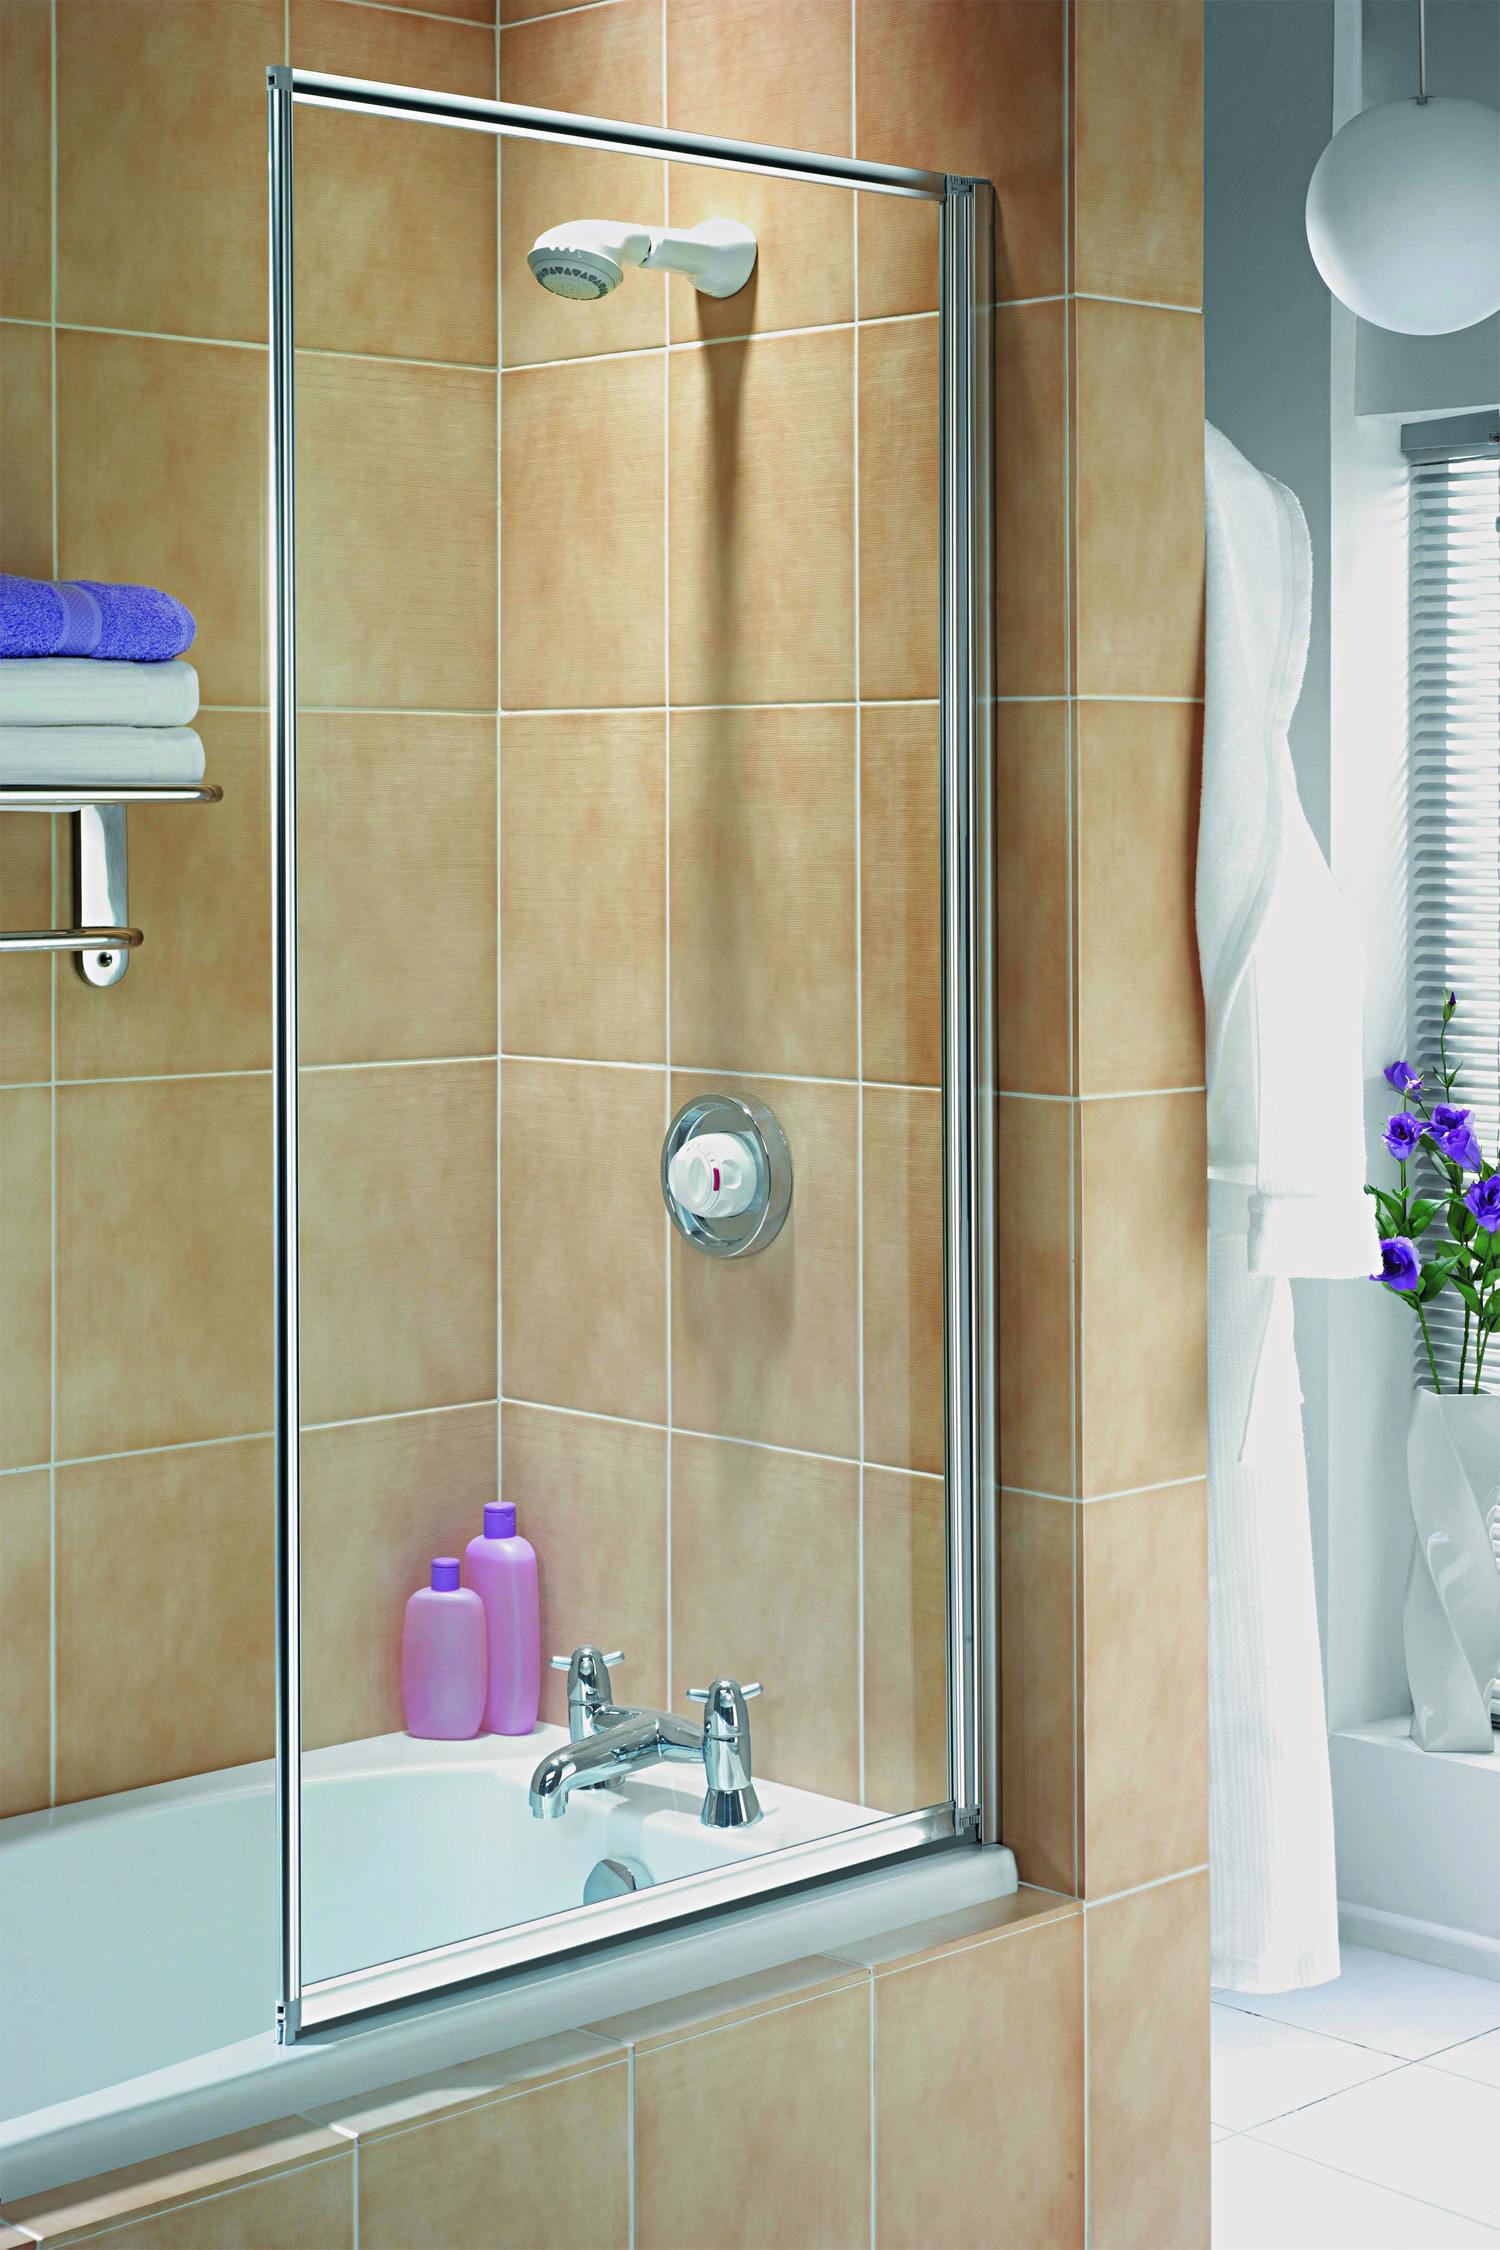 kitchen splash guard gray glass subway tile backsplash aqualux aqua 3 fully framed bath screen white - fs6456aqu